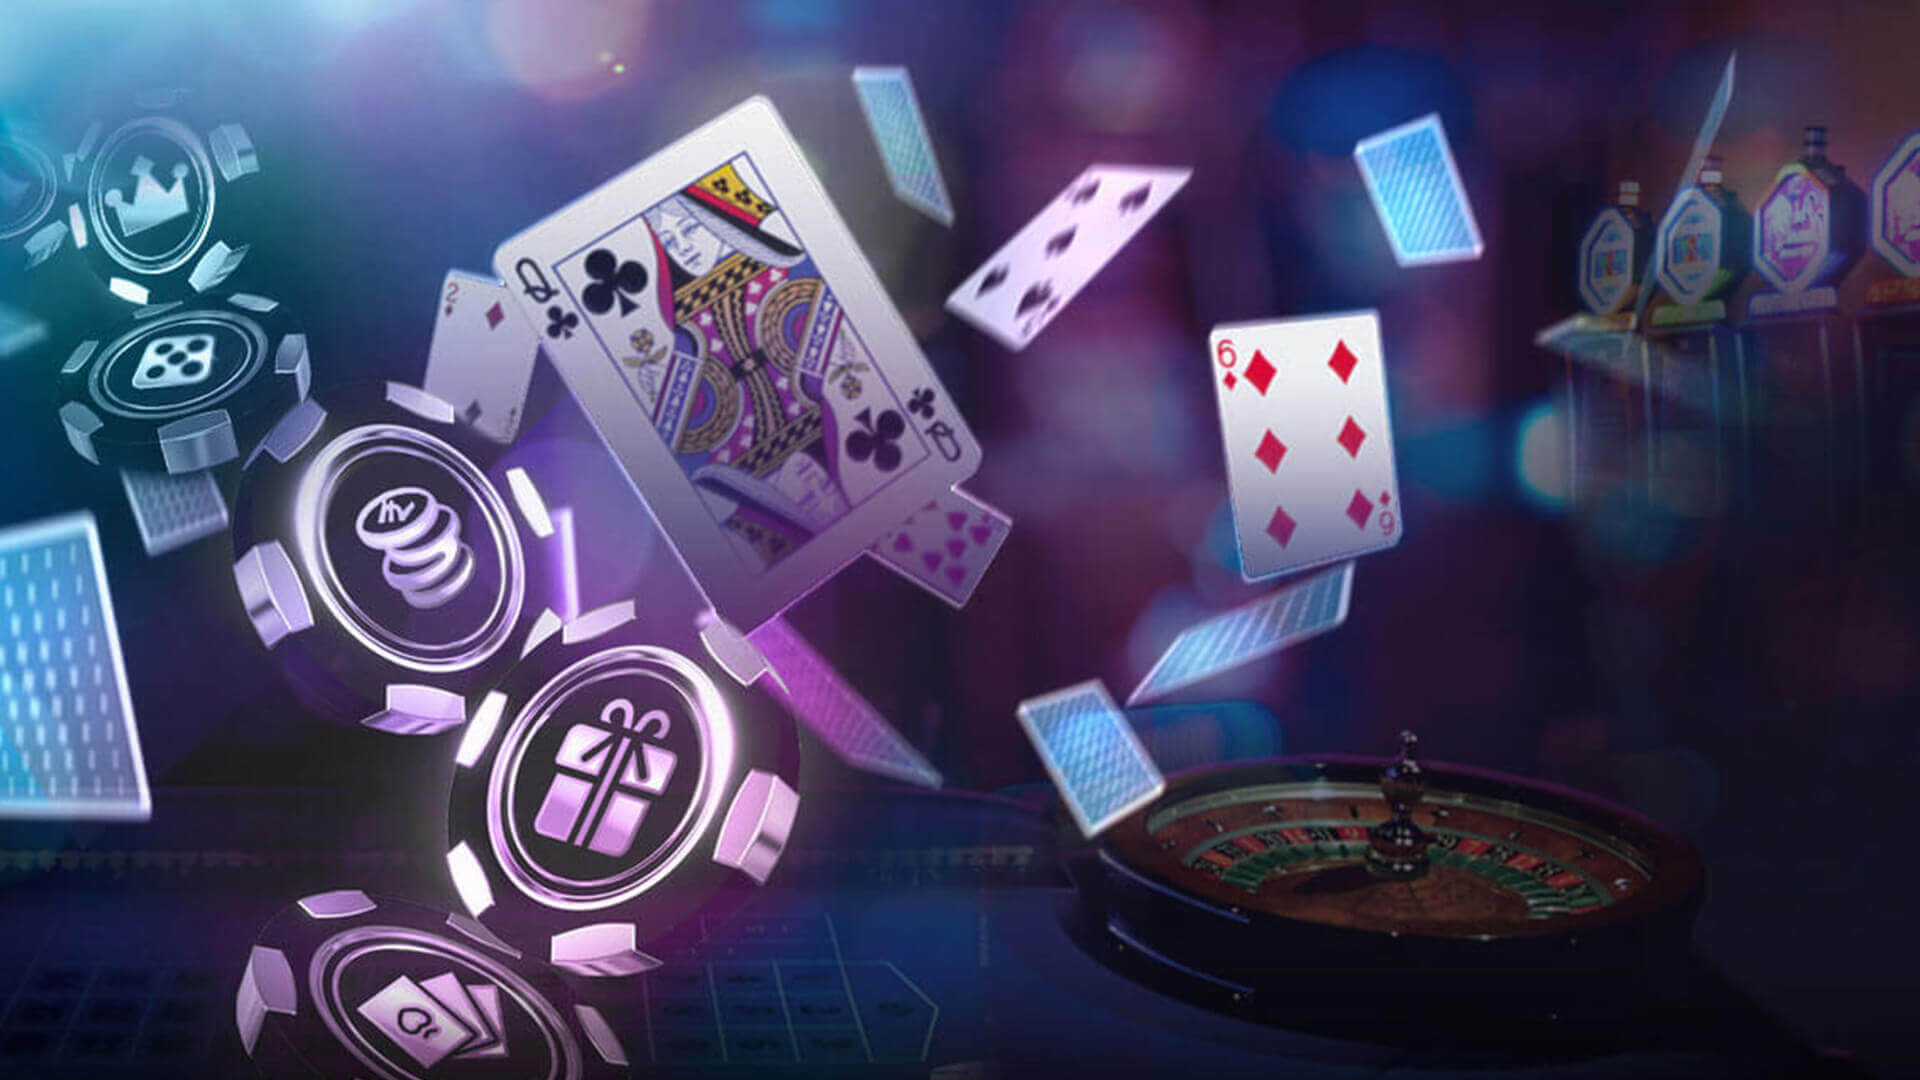 In online casinos, you get the best Online gambling (judi online) post thumbnail image